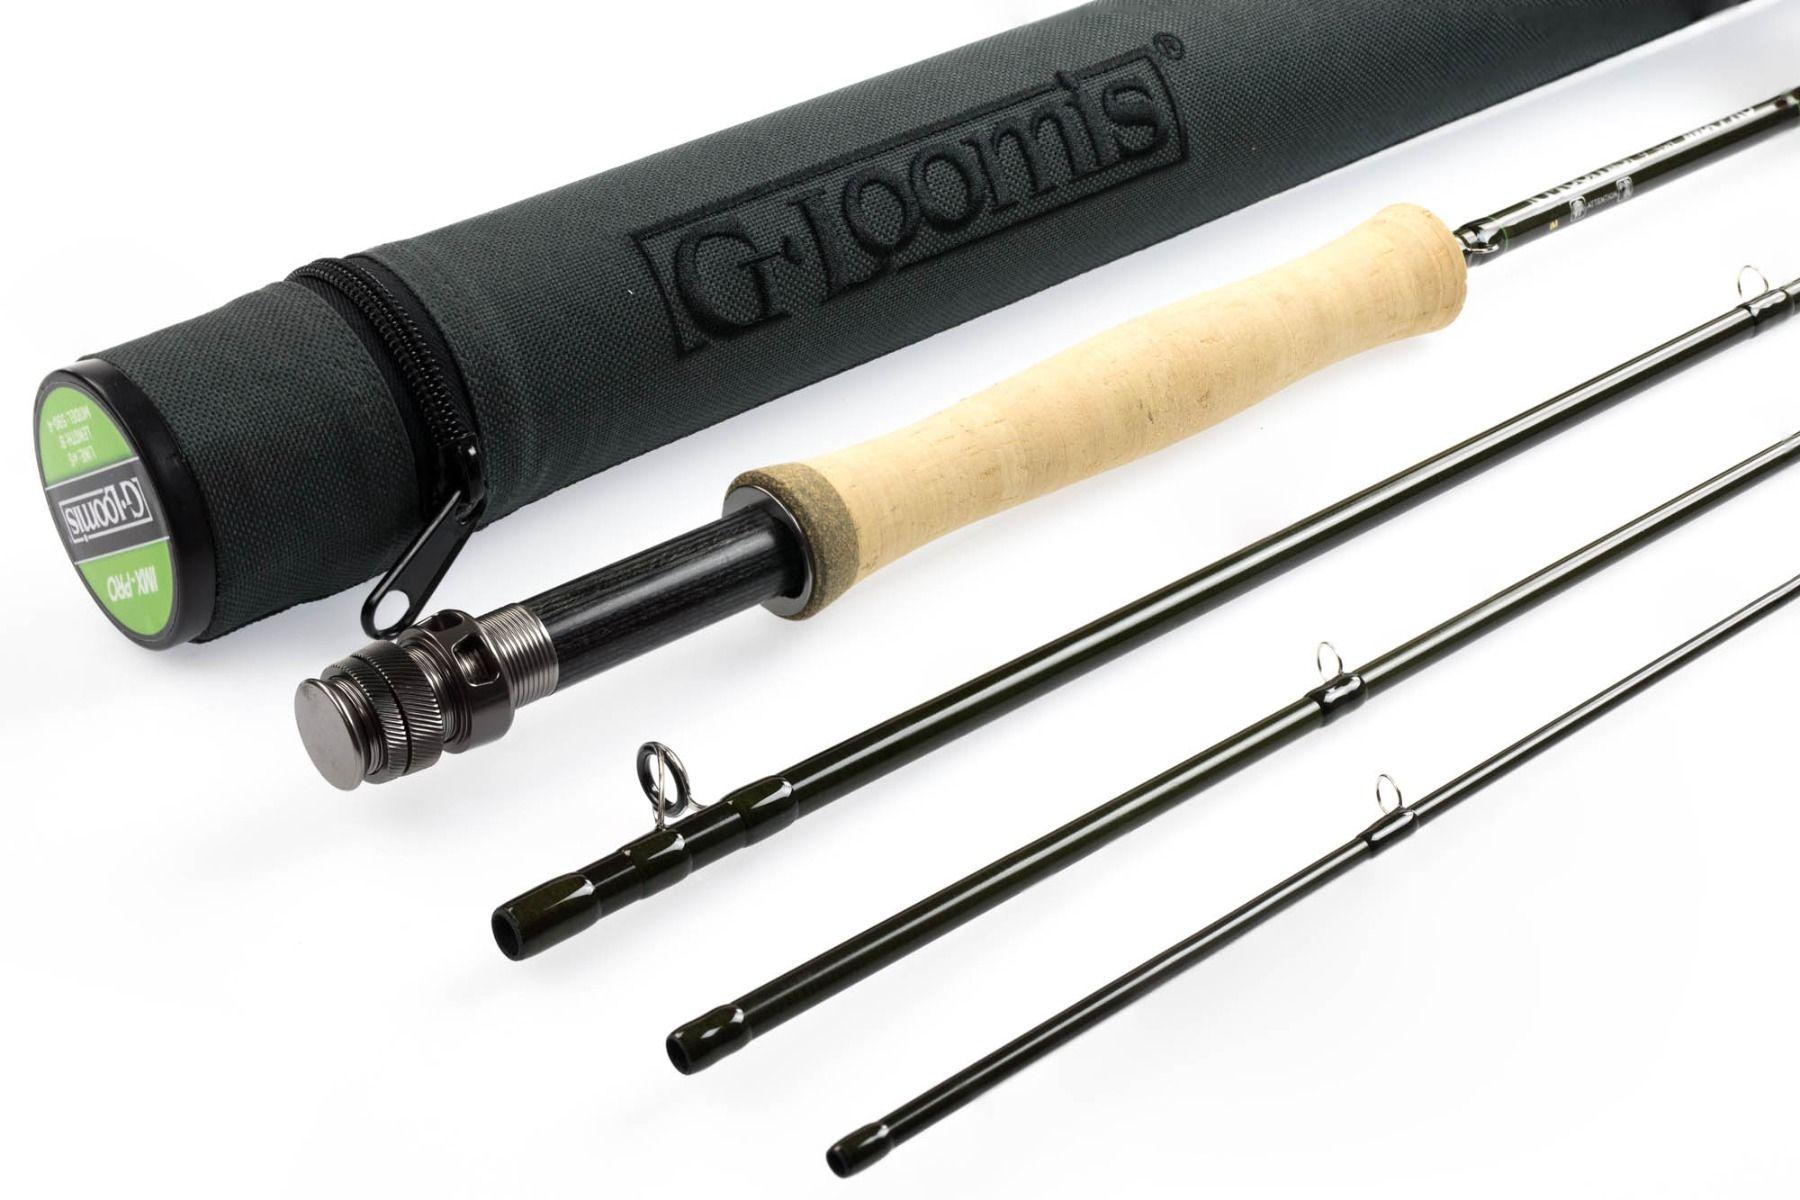 Loomis IMX-PRO 8810-1 Streamer Fly Rod G